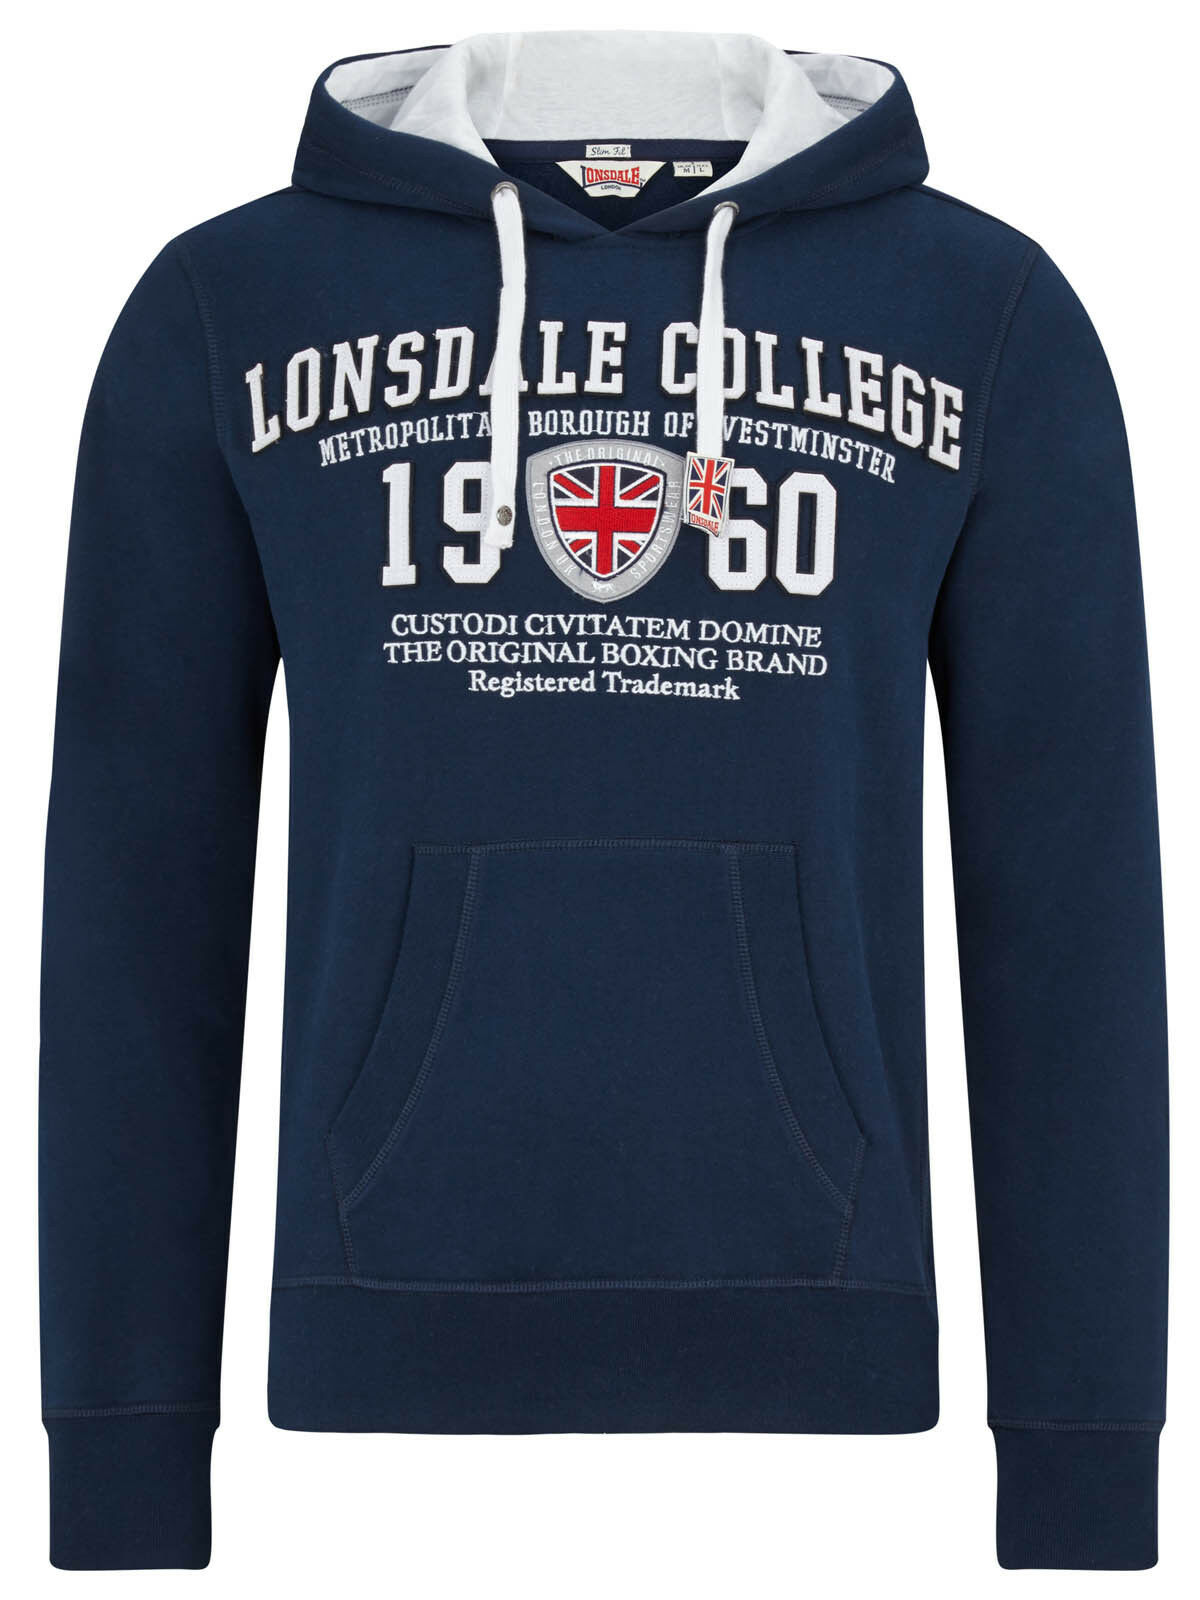 POLO SPORT RALPH LAUREN Vintage 1/4 Zip rosso Pullover Sweatshirt L Spell Out Sz L Sweatshirt cc0dfa